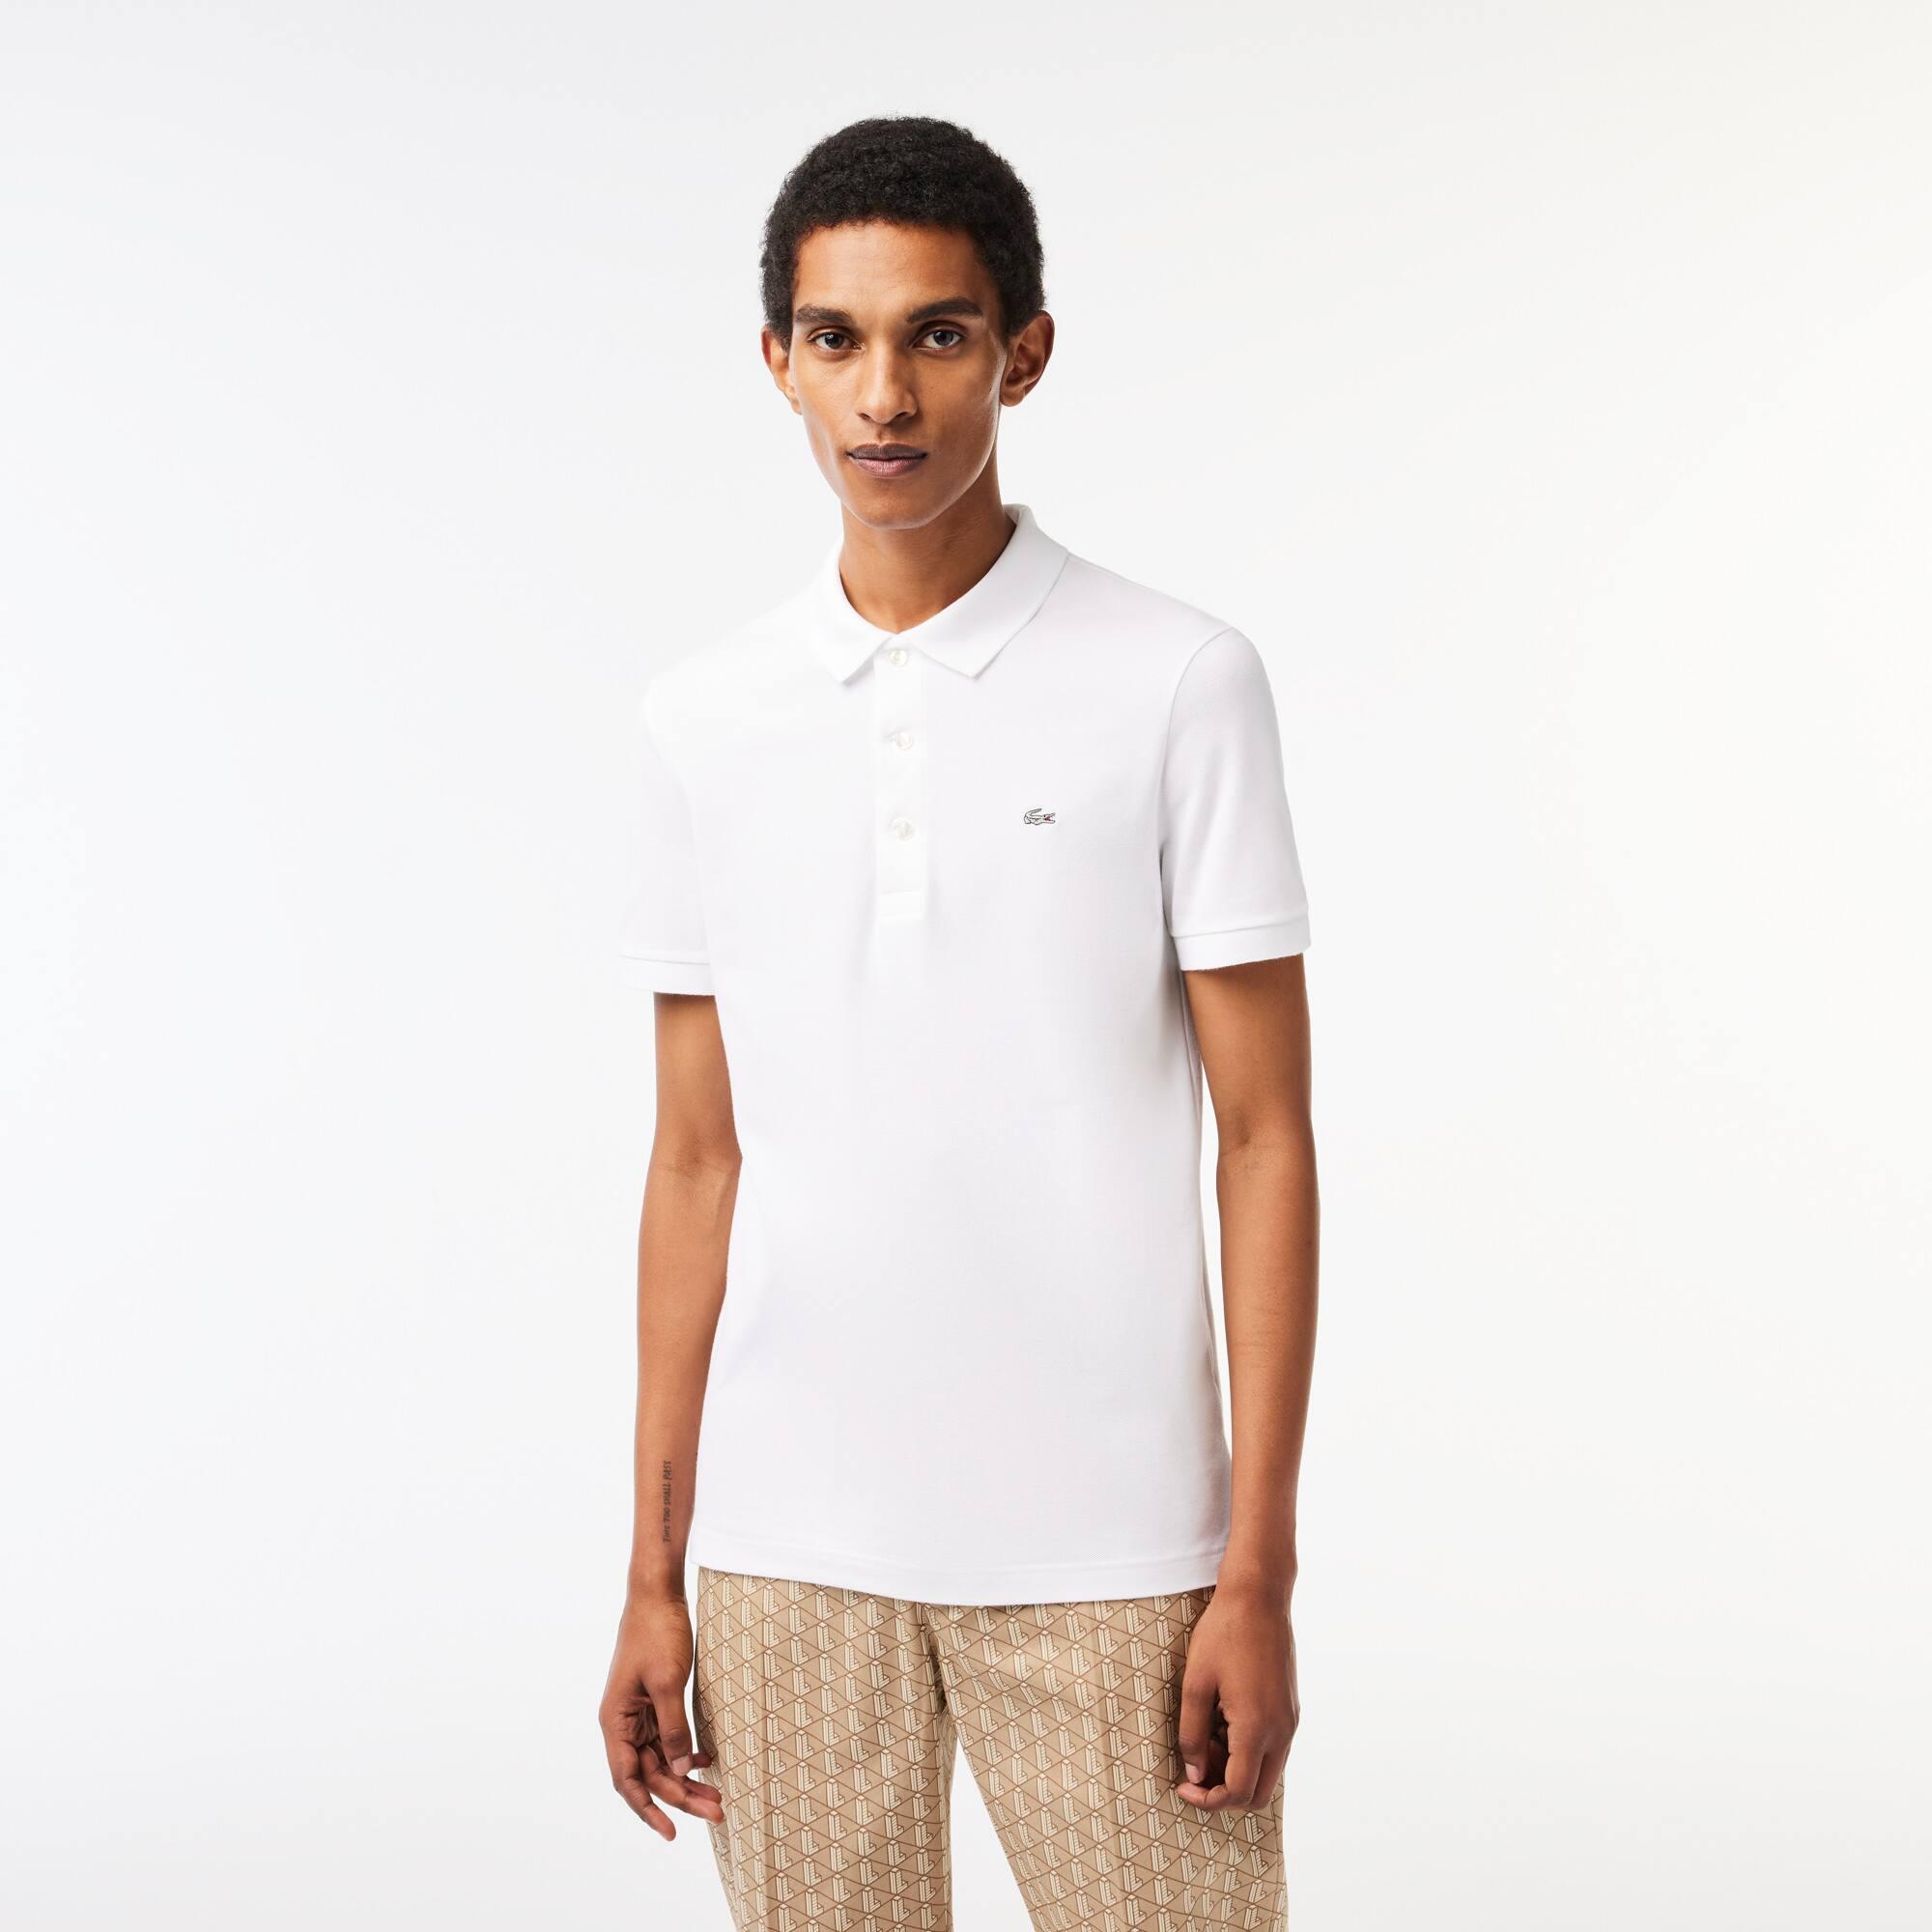 24adab34cdb Camisa Polo Lacoste Slim Fit Masculina em Petit piquet Stretch